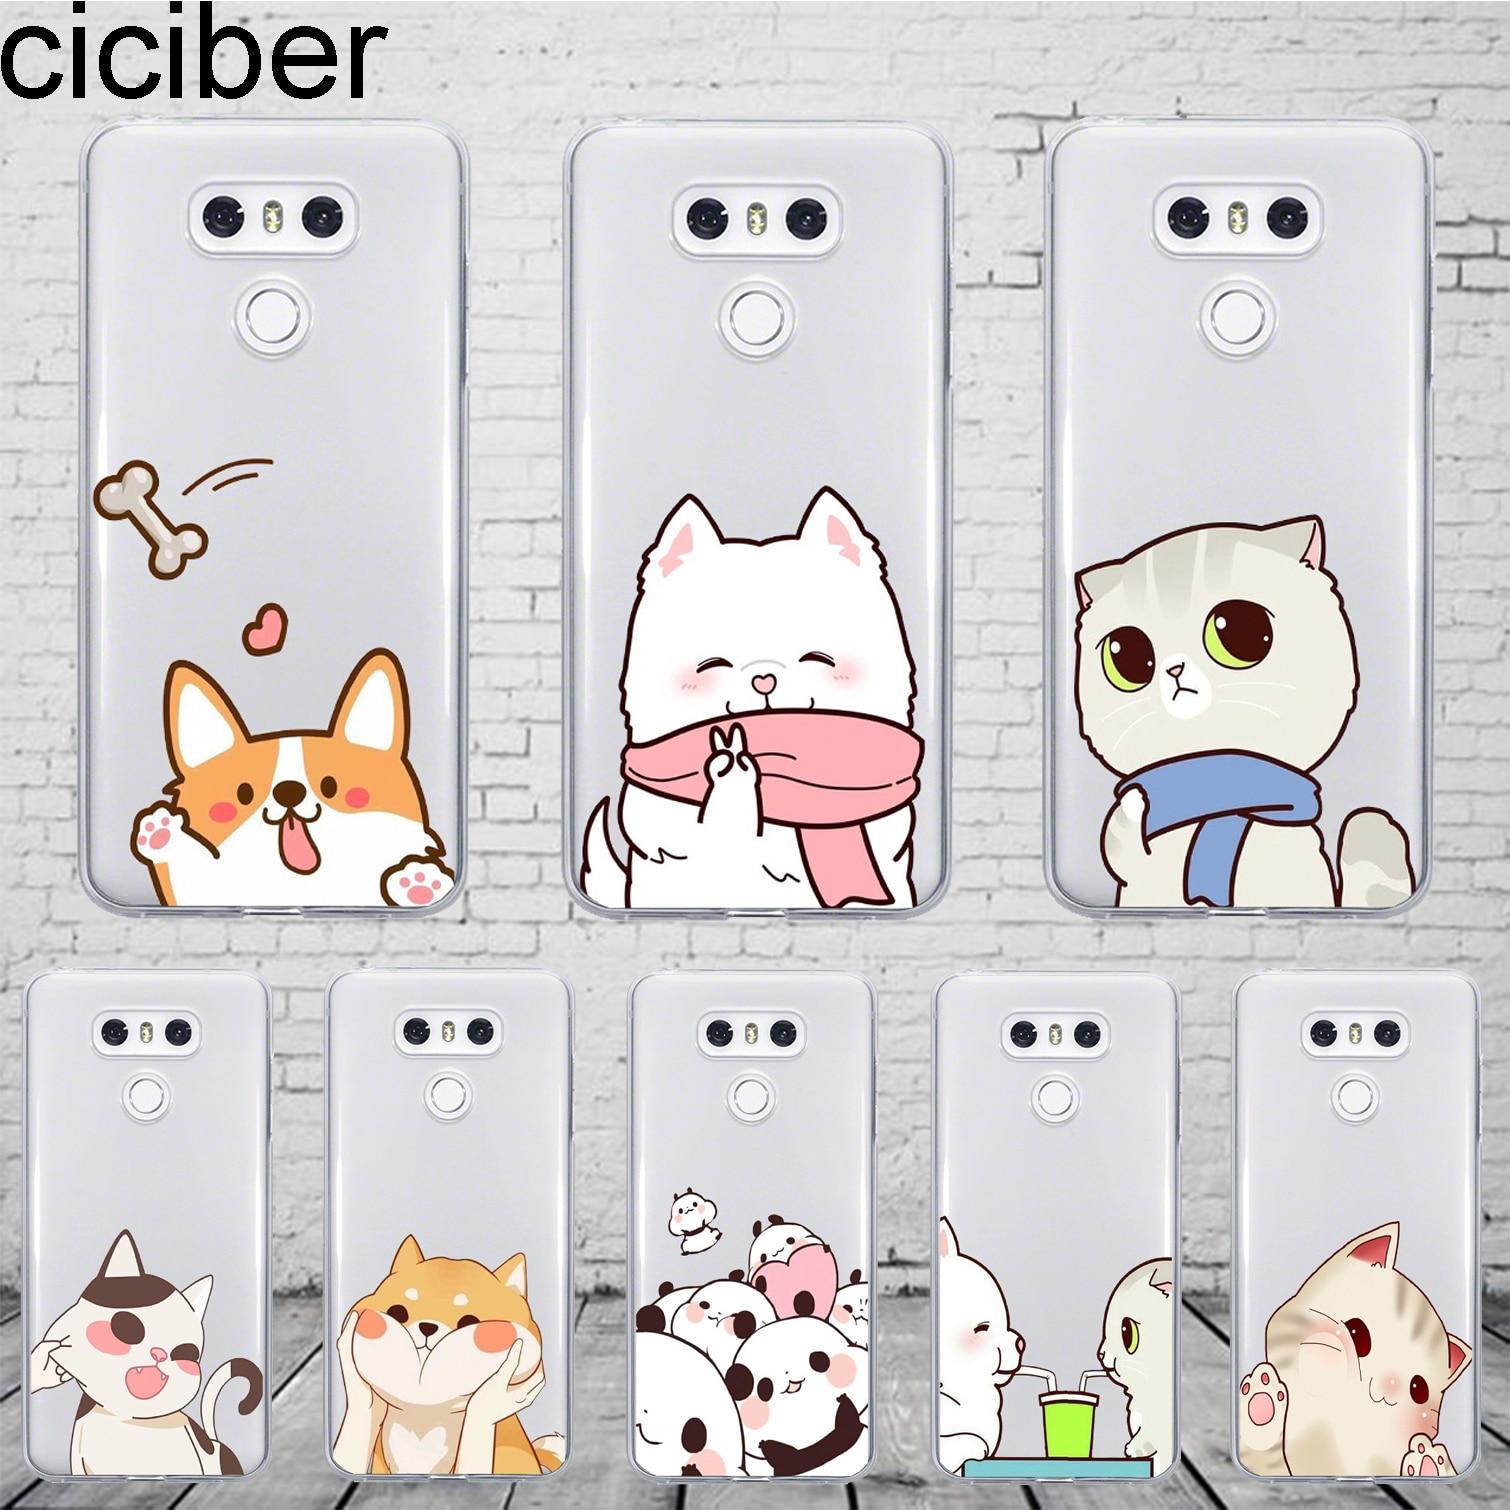 Cartoon Dog Cat Cover For LG G6 G7 G5 G4 V30 V35 V40 THINQ TPU For LG K10 K8 K7 K4 2017 2018 K9 K11 Plus Phone Cases TPU